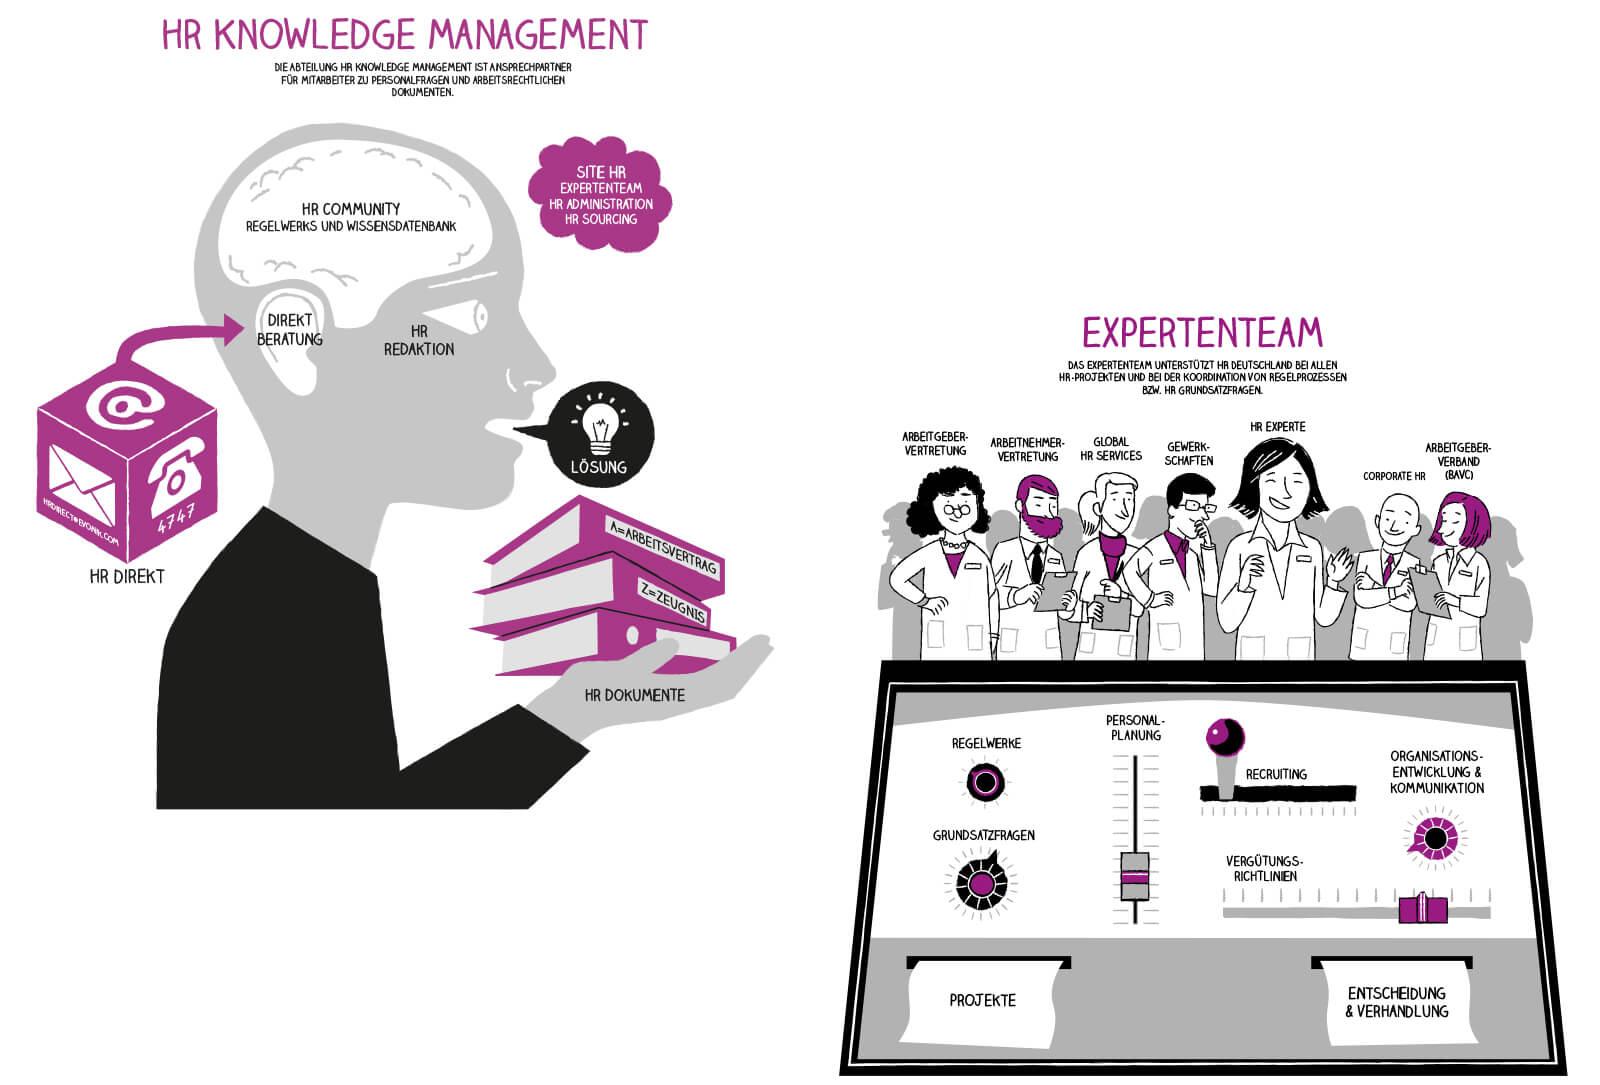 Evonik Industries AG Live Graphic Recording HR Knowledge Management